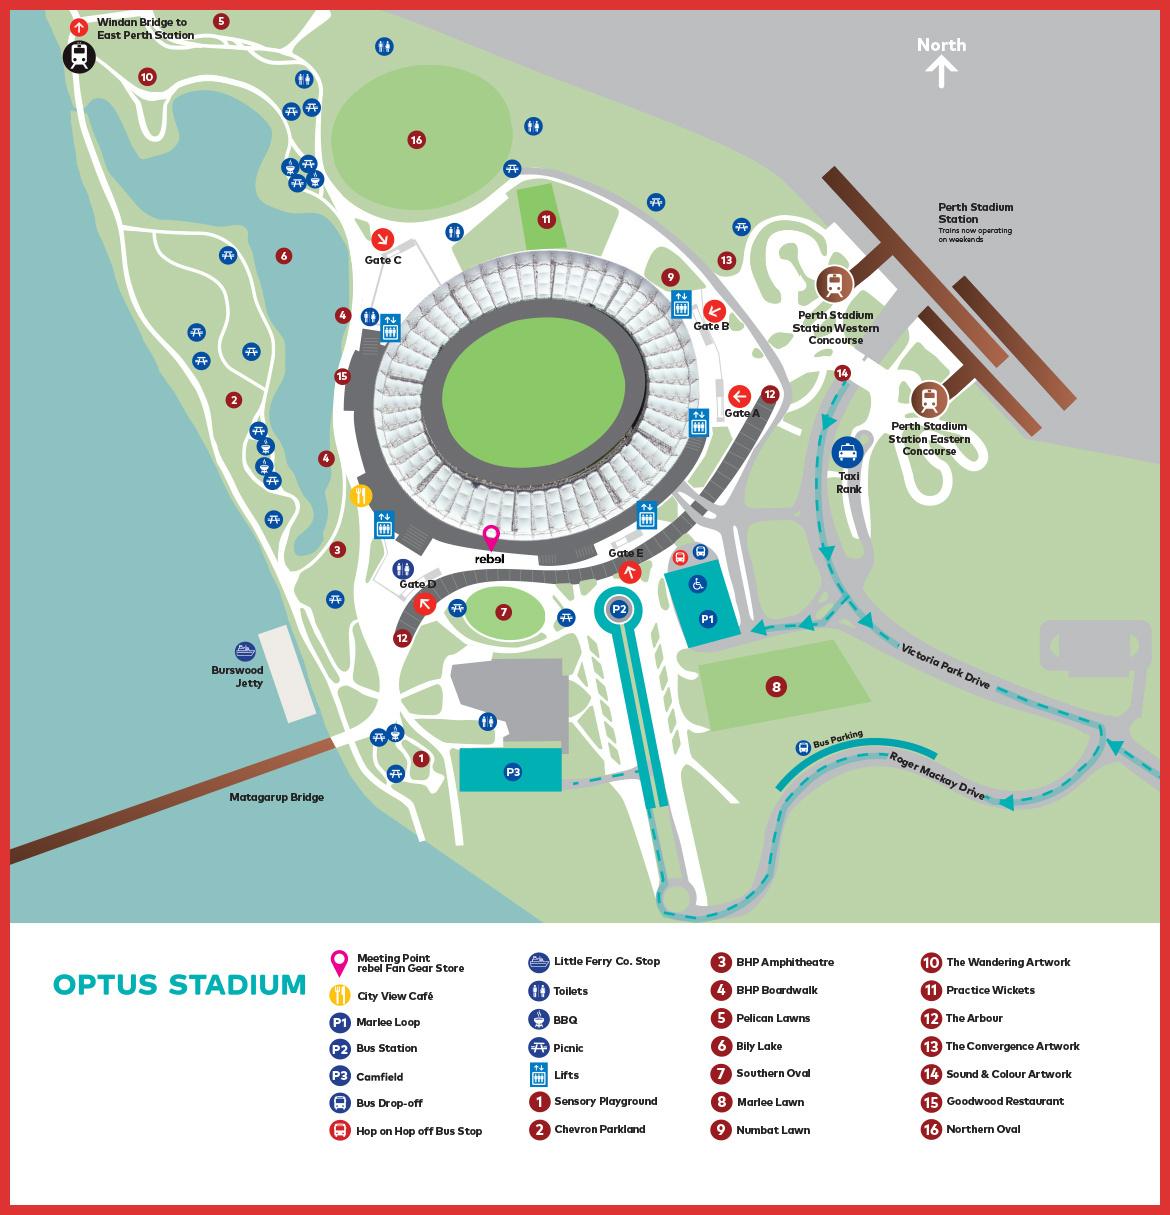 Perth Stadium Lights Youtube: Optus Stadium Map